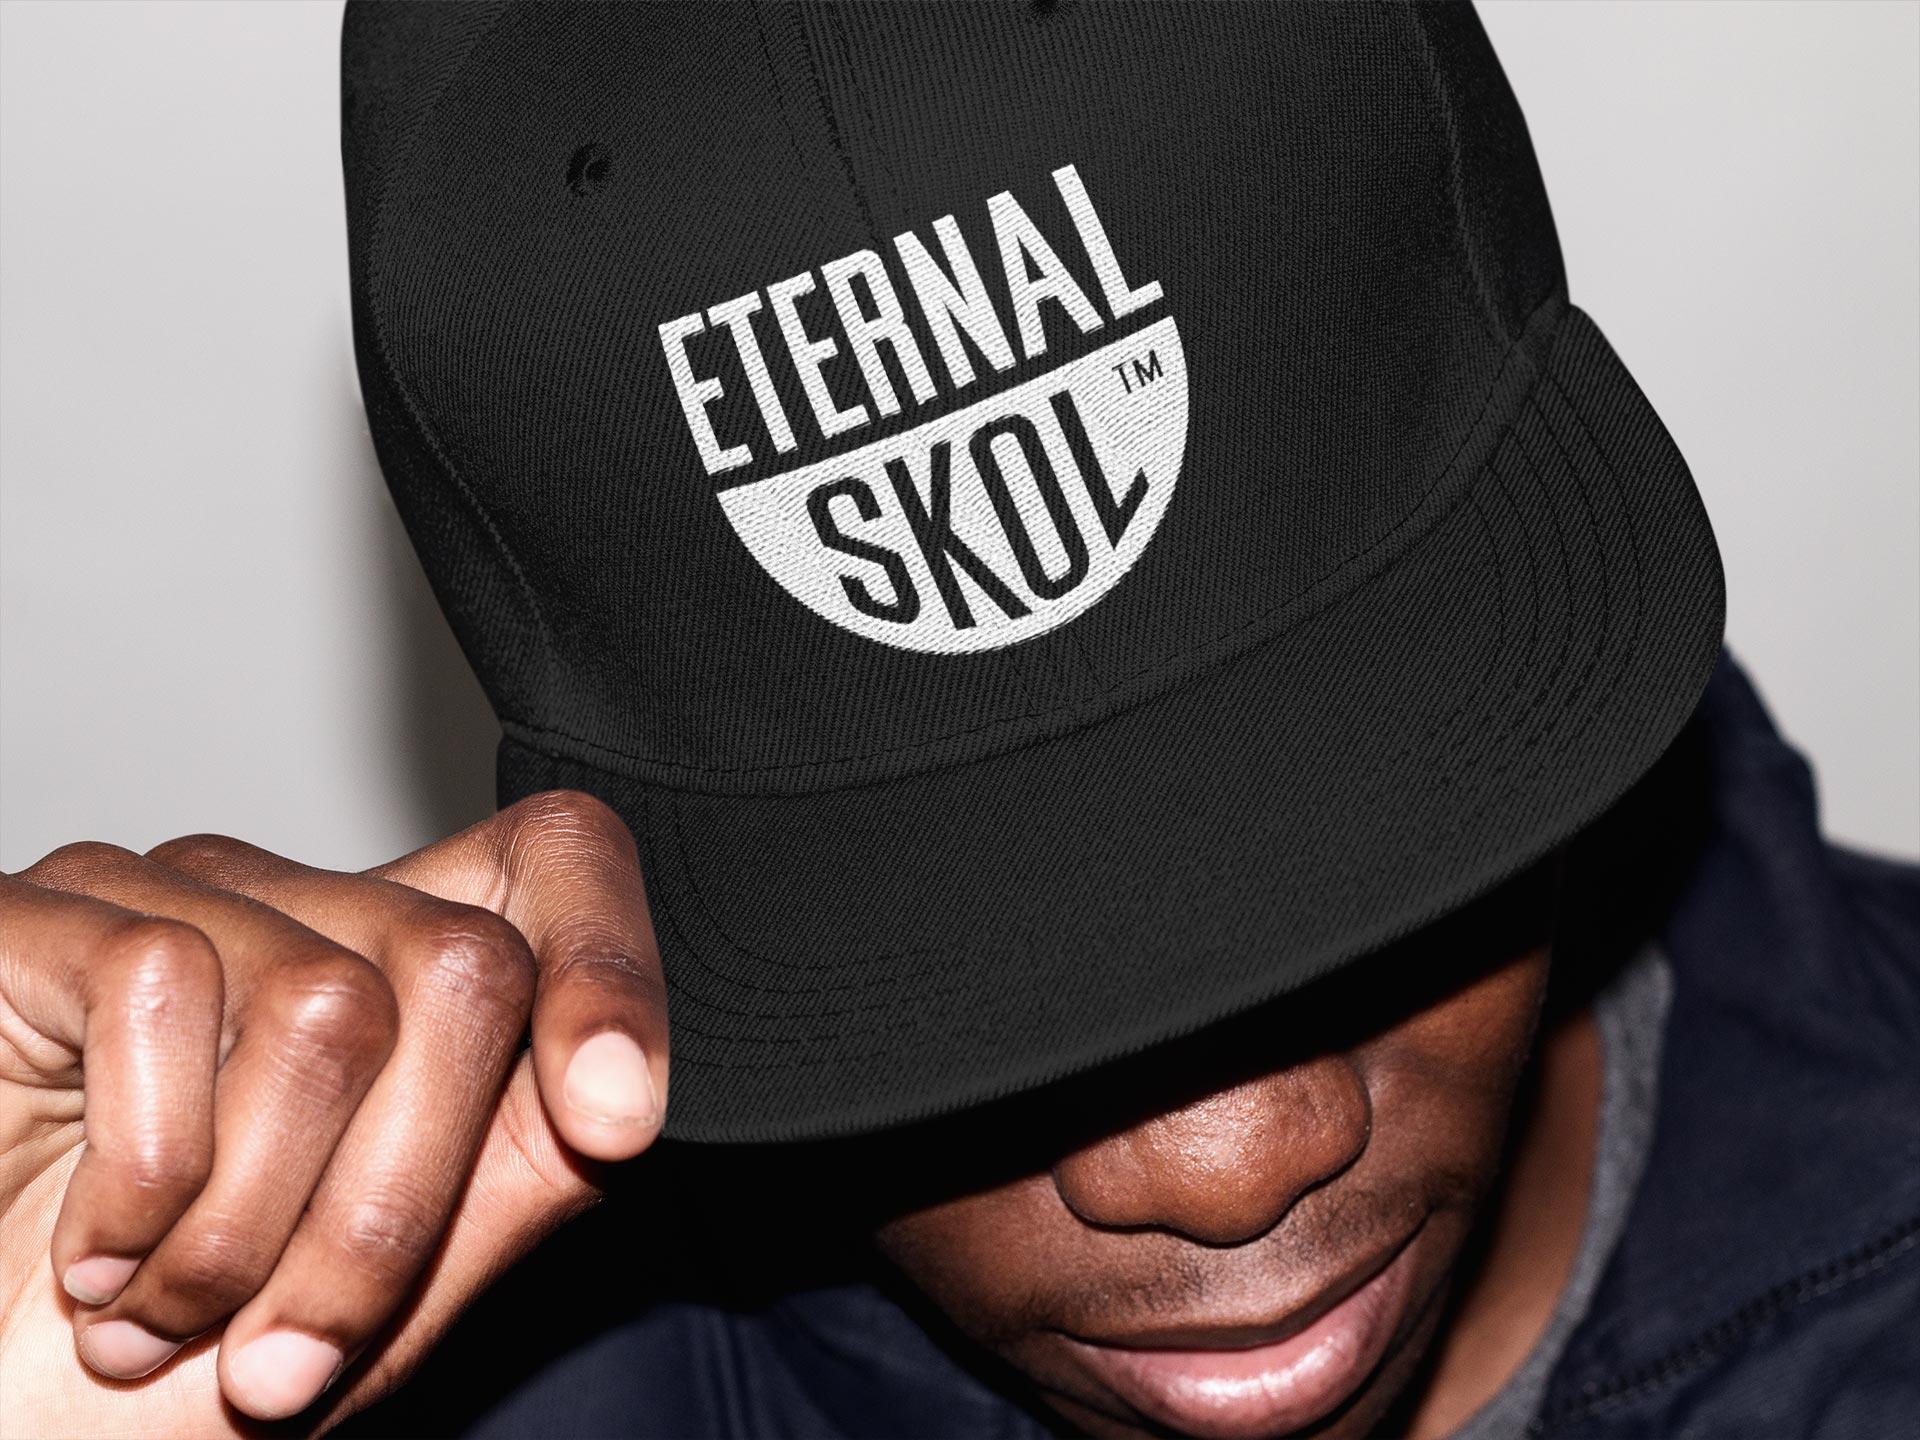 Eternal Skol brand identity used on cap